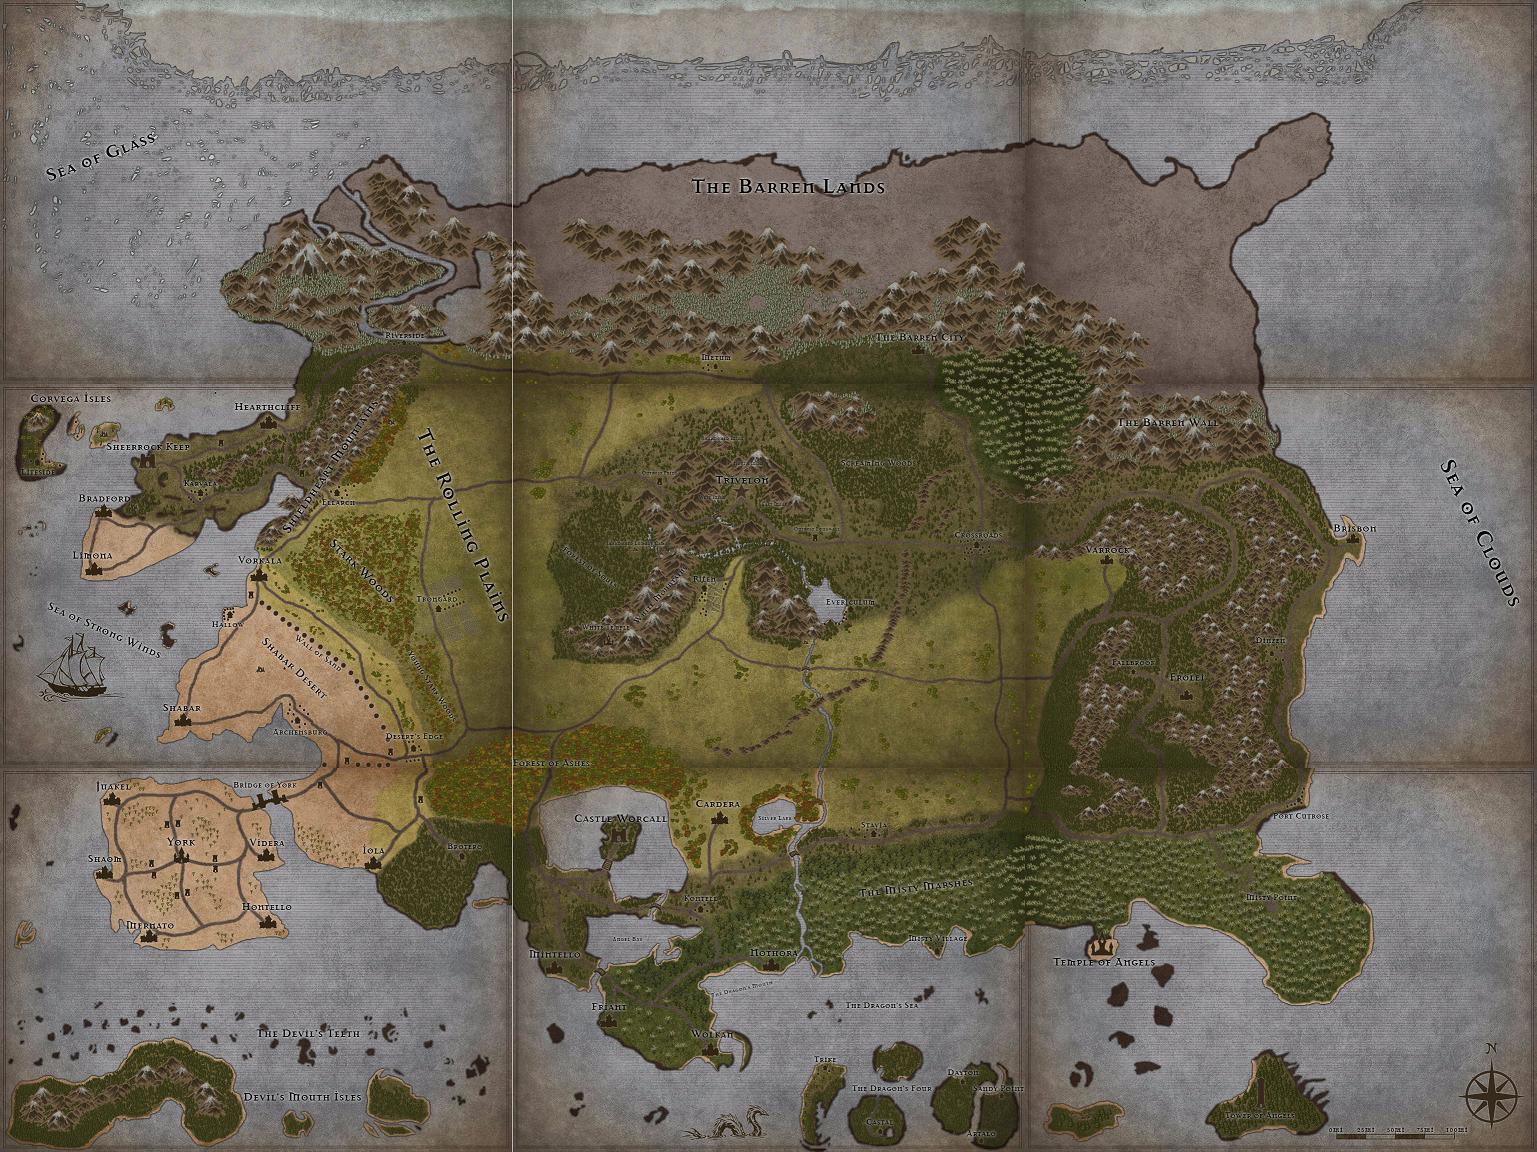 D&D Assets #4 (75Mb) - Elder Scrolls D&D, Donjon, Inkarnate, World